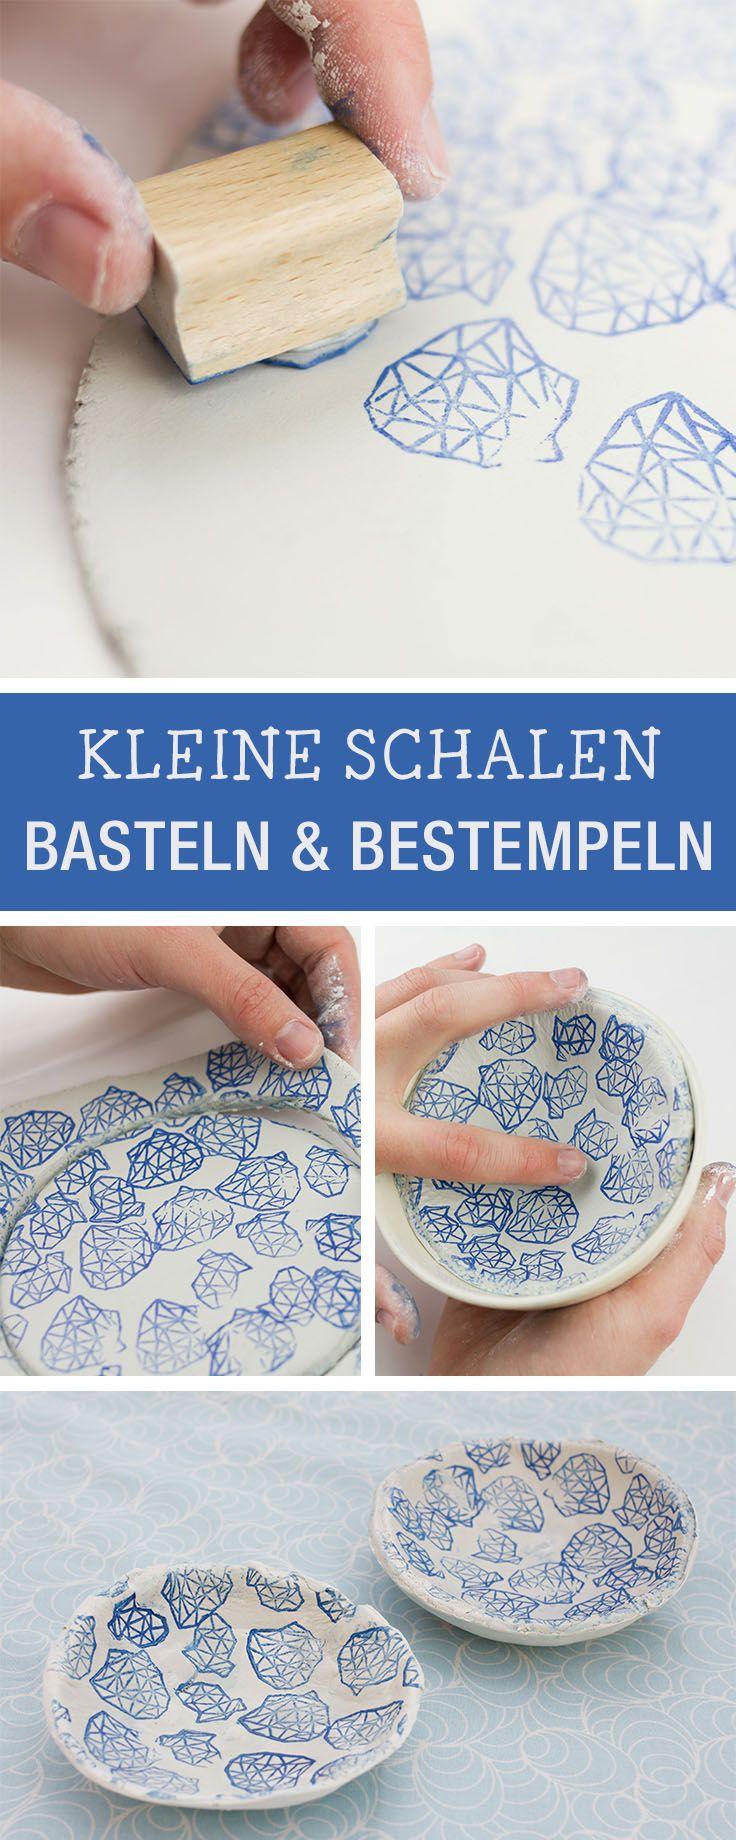 DIY-Anleitung für eine bestempelte Tonschale / diy inspiration for a handcrafted and stamped bowl via DaWanda.com